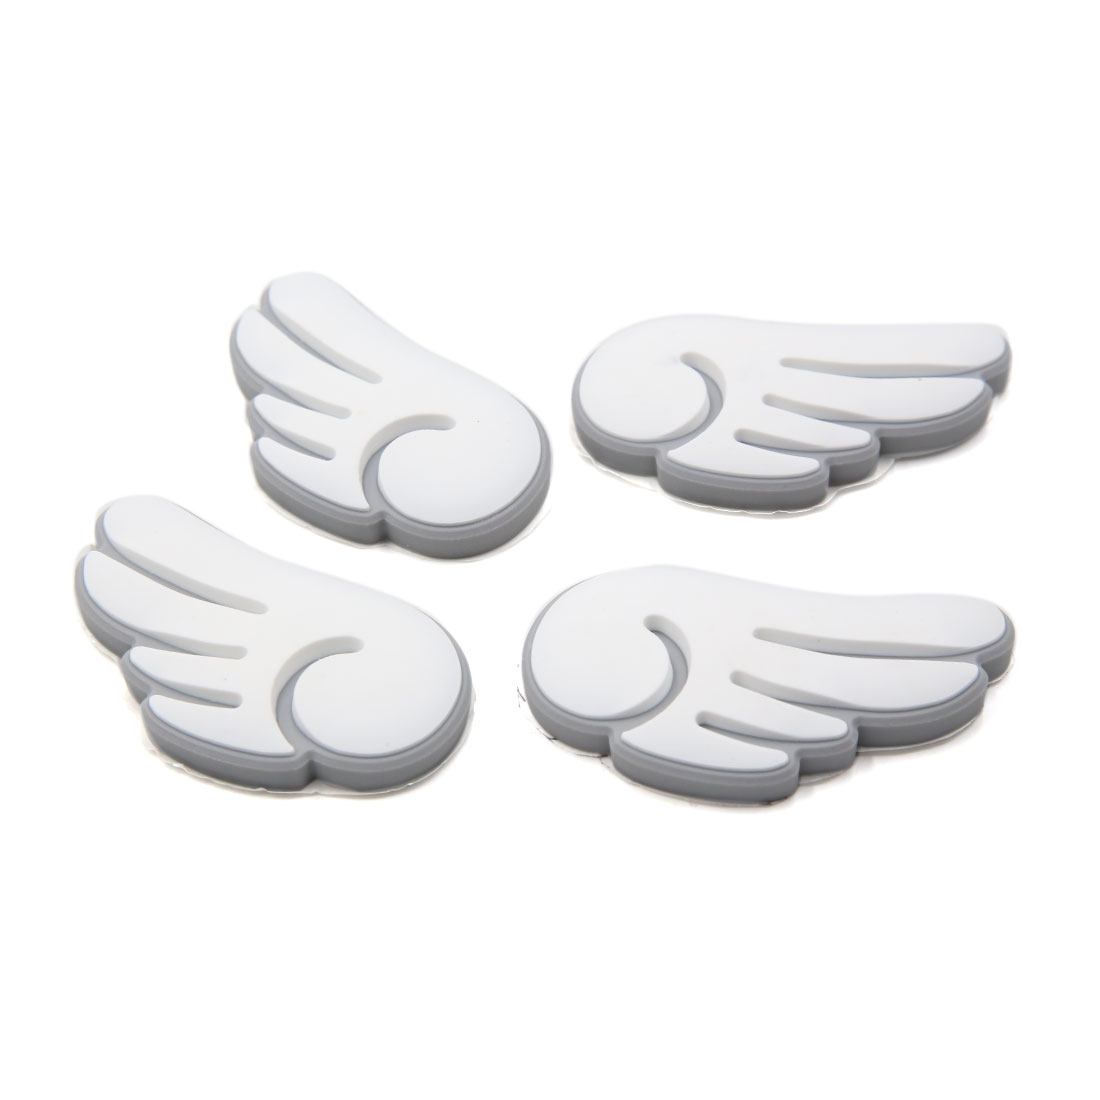 4 Pcs White Wing Design Door Edge Guard Sticker Protector Decor for Car Vehicle